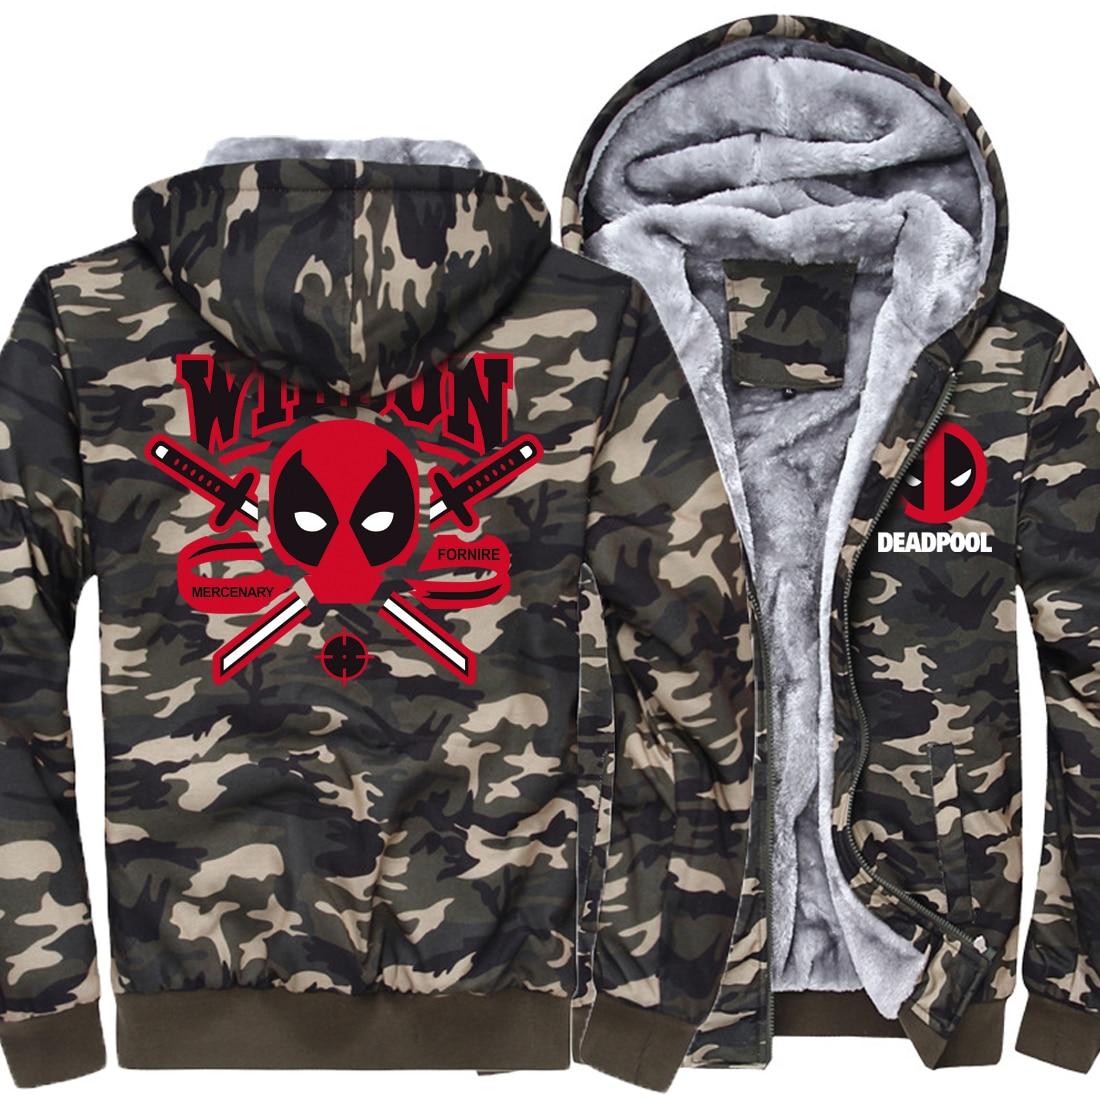 High Quality Winter Jacket 2019 New Fashion Streetwear Punk Style Camouflage Thick Hoodies Men DEAD POOL Hip Hop Sweatshirts